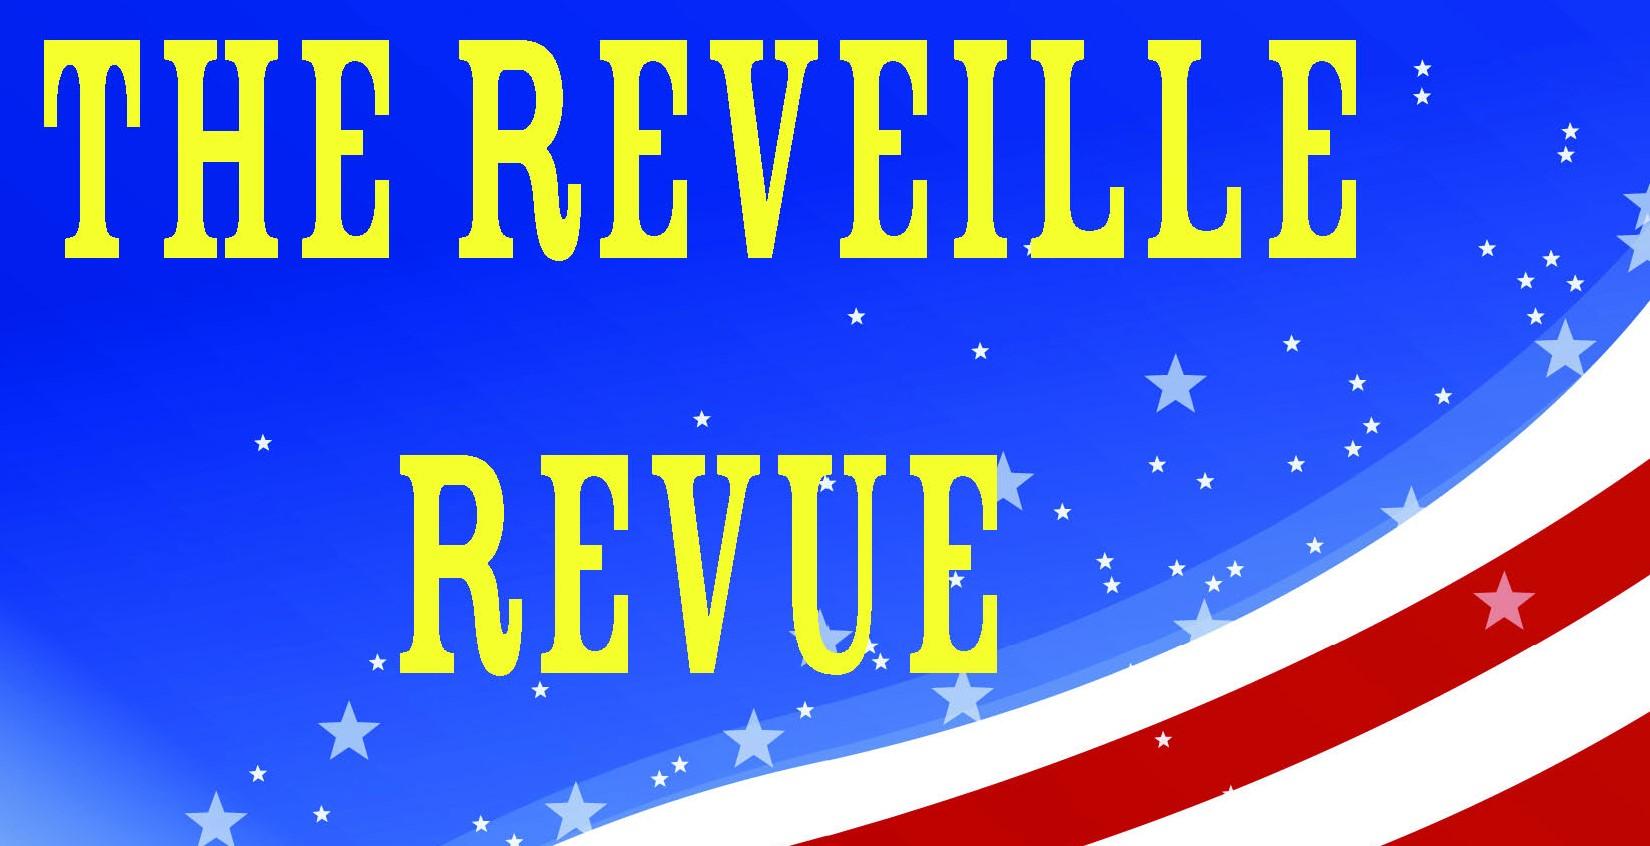 THE REVEILLE REVUE